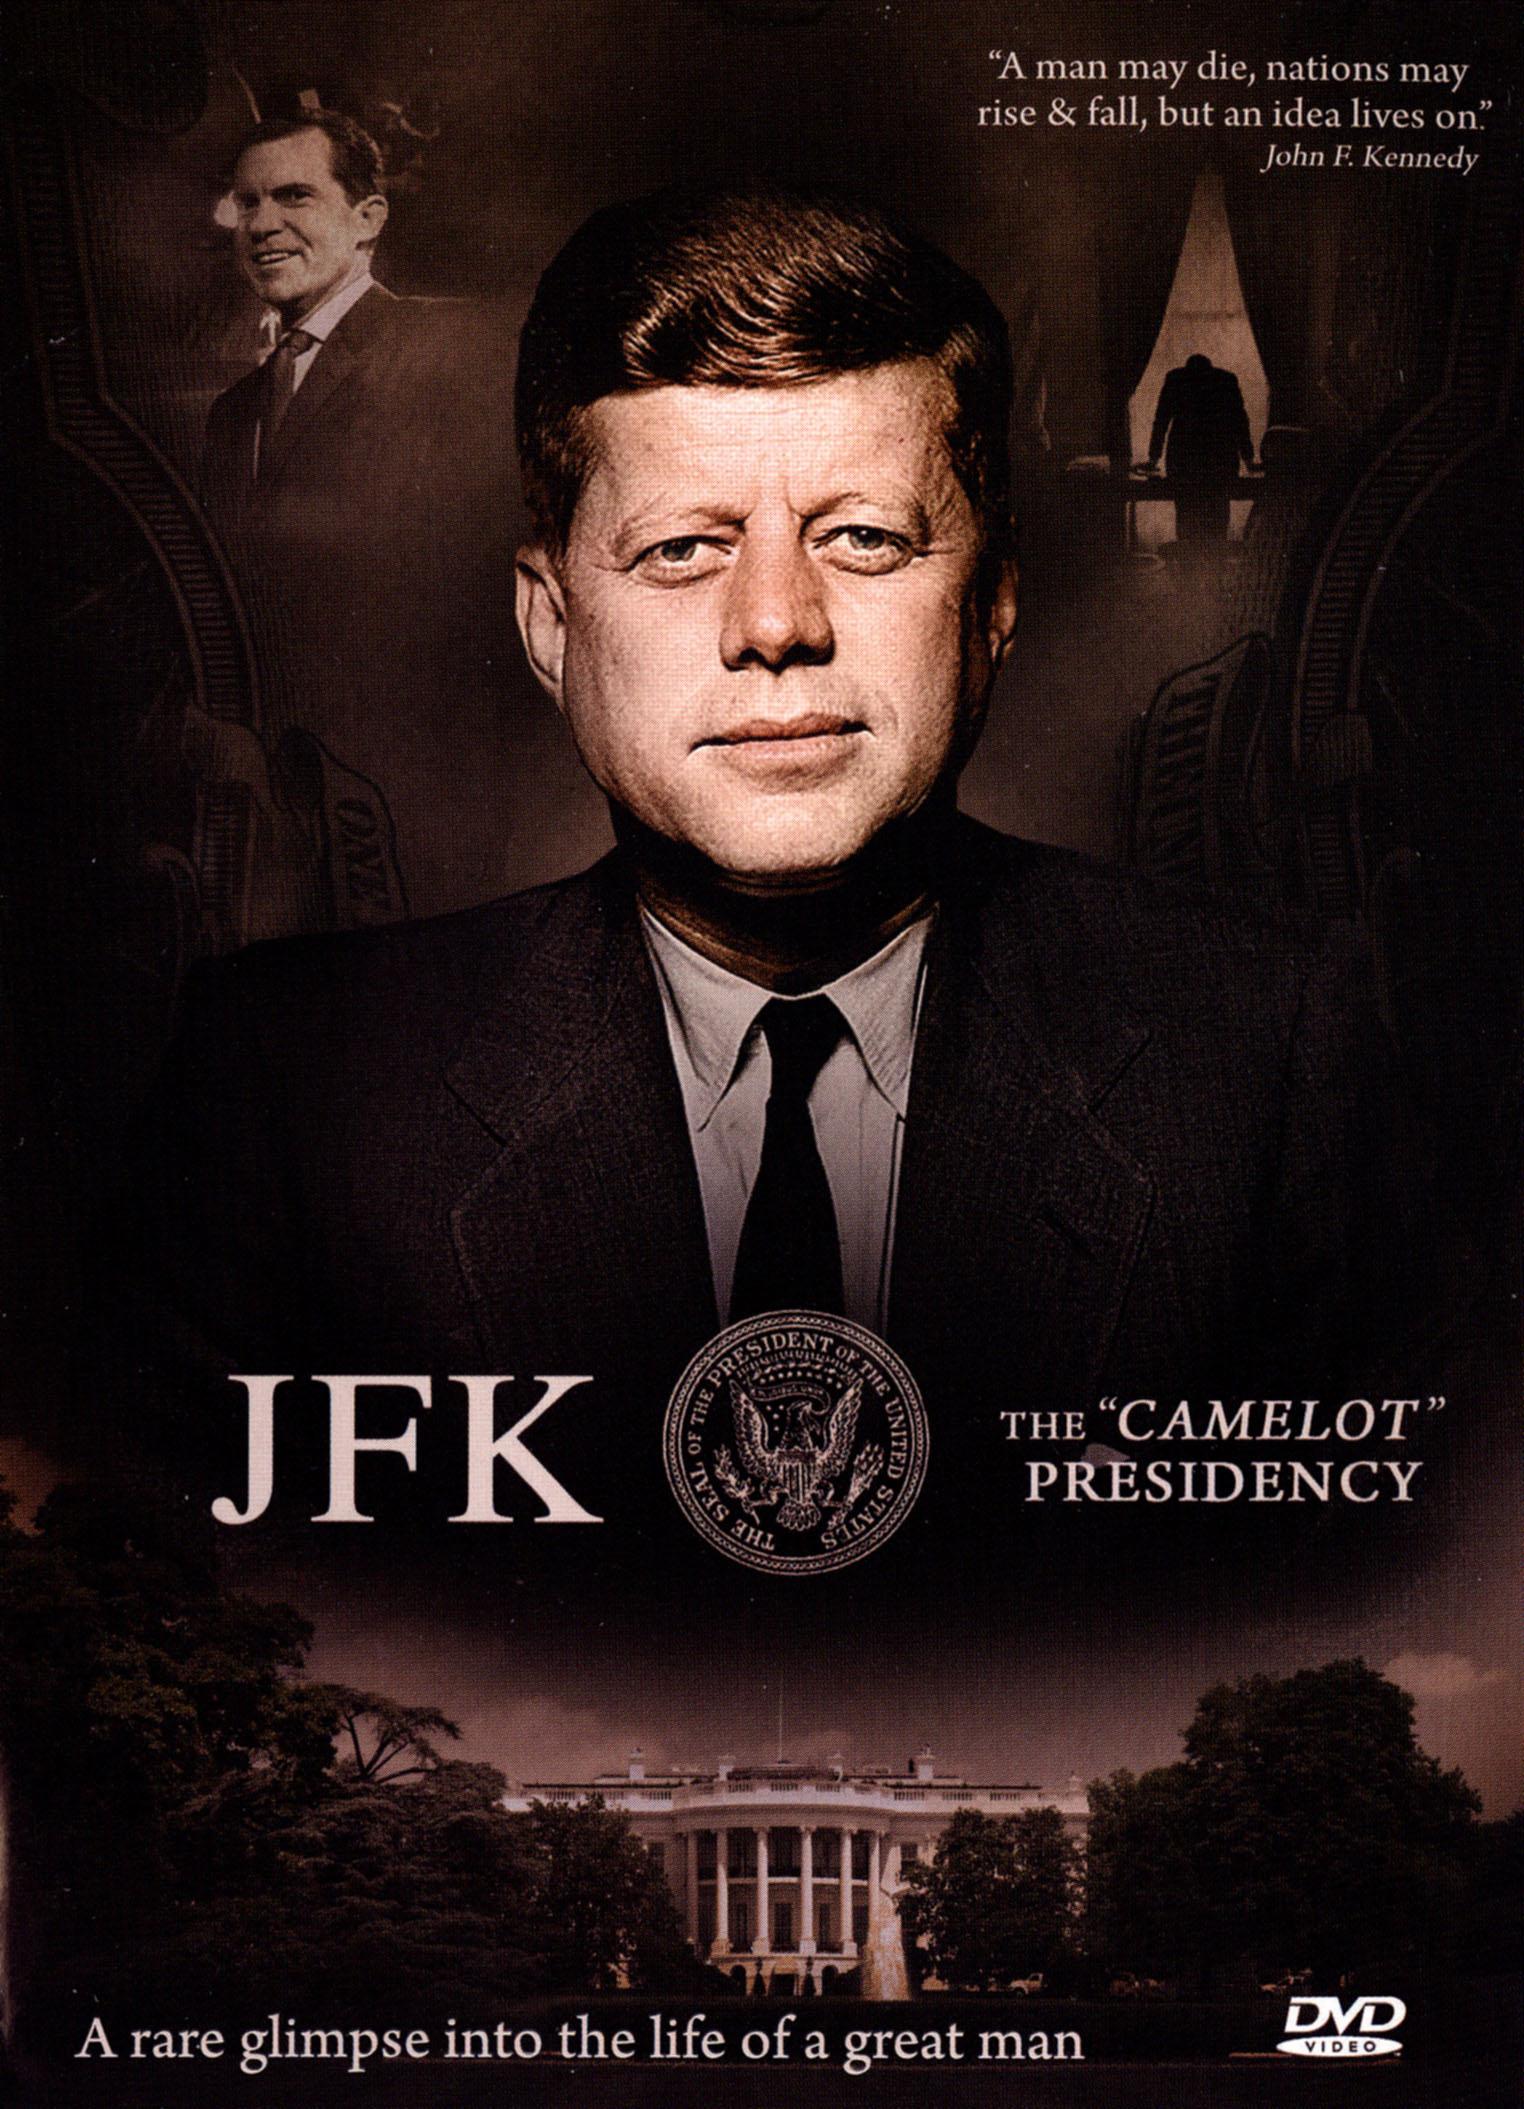 JFK: The Camelot Presidency